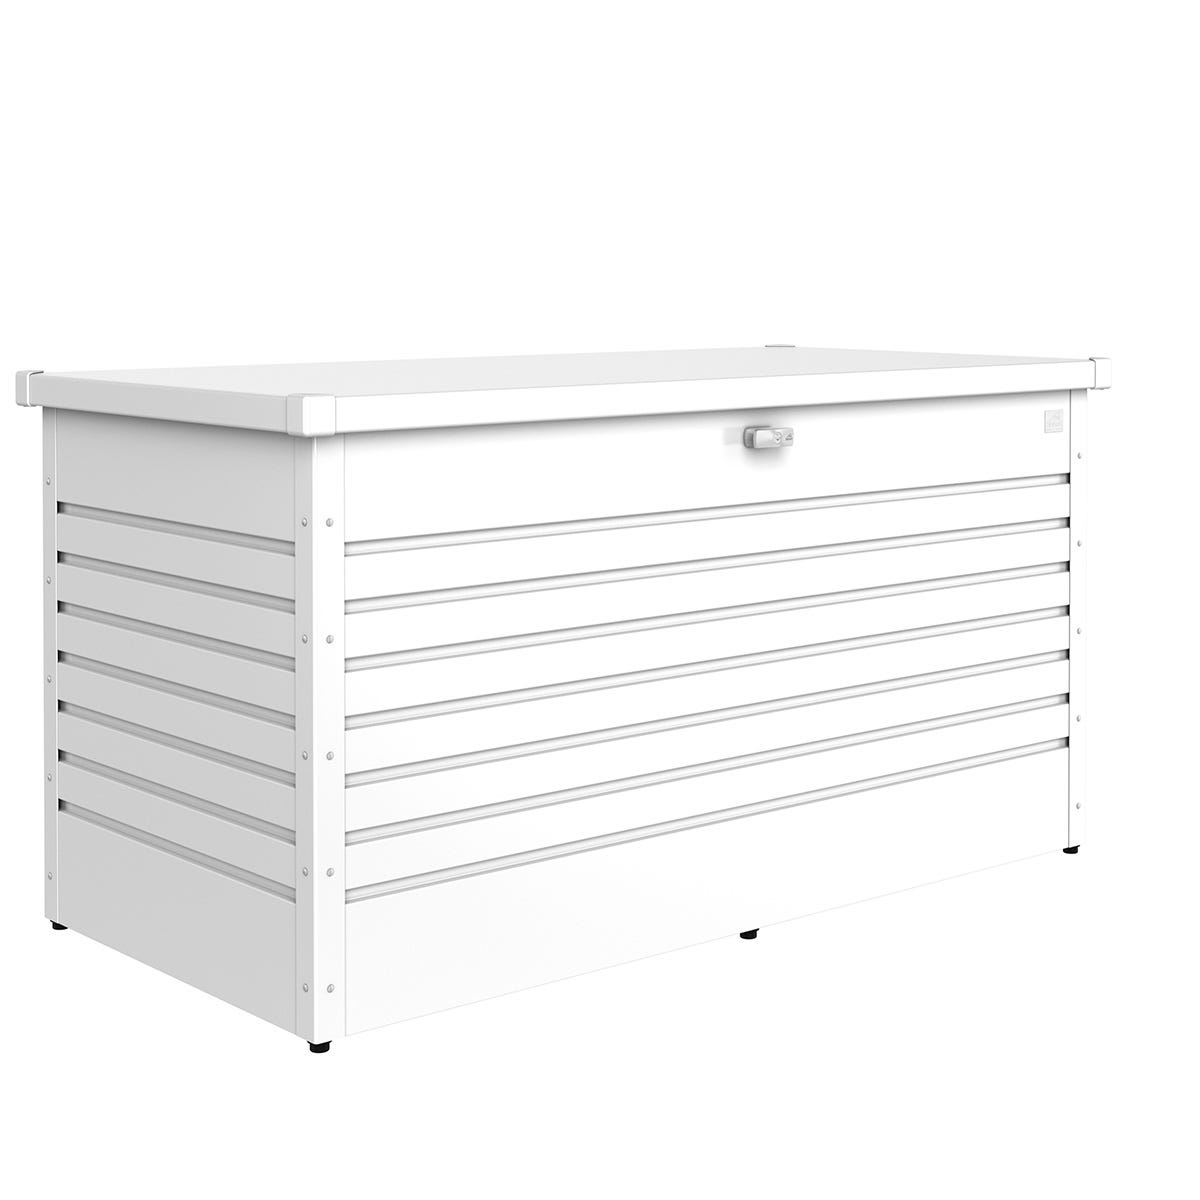 Biohort LeisureTime 5' x 2' Storage Box 160 - White